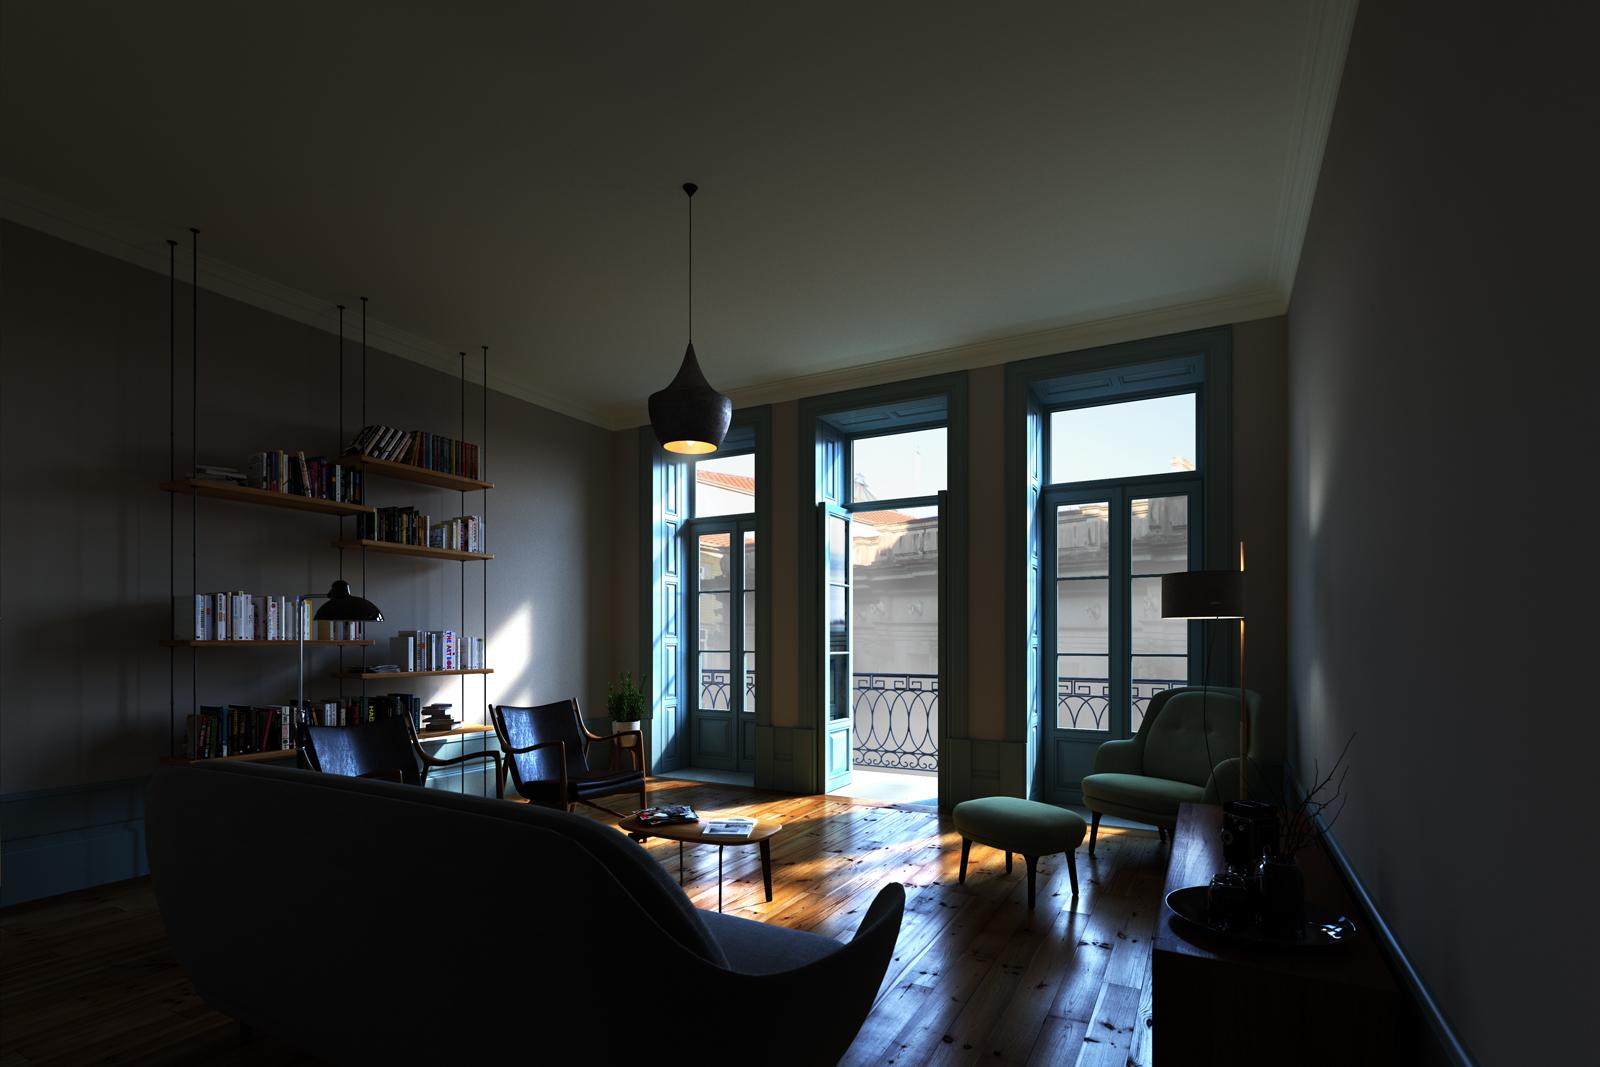 Arqrq rui quaresma habita o multifamiliar almada living for Apart hotel lisbonne